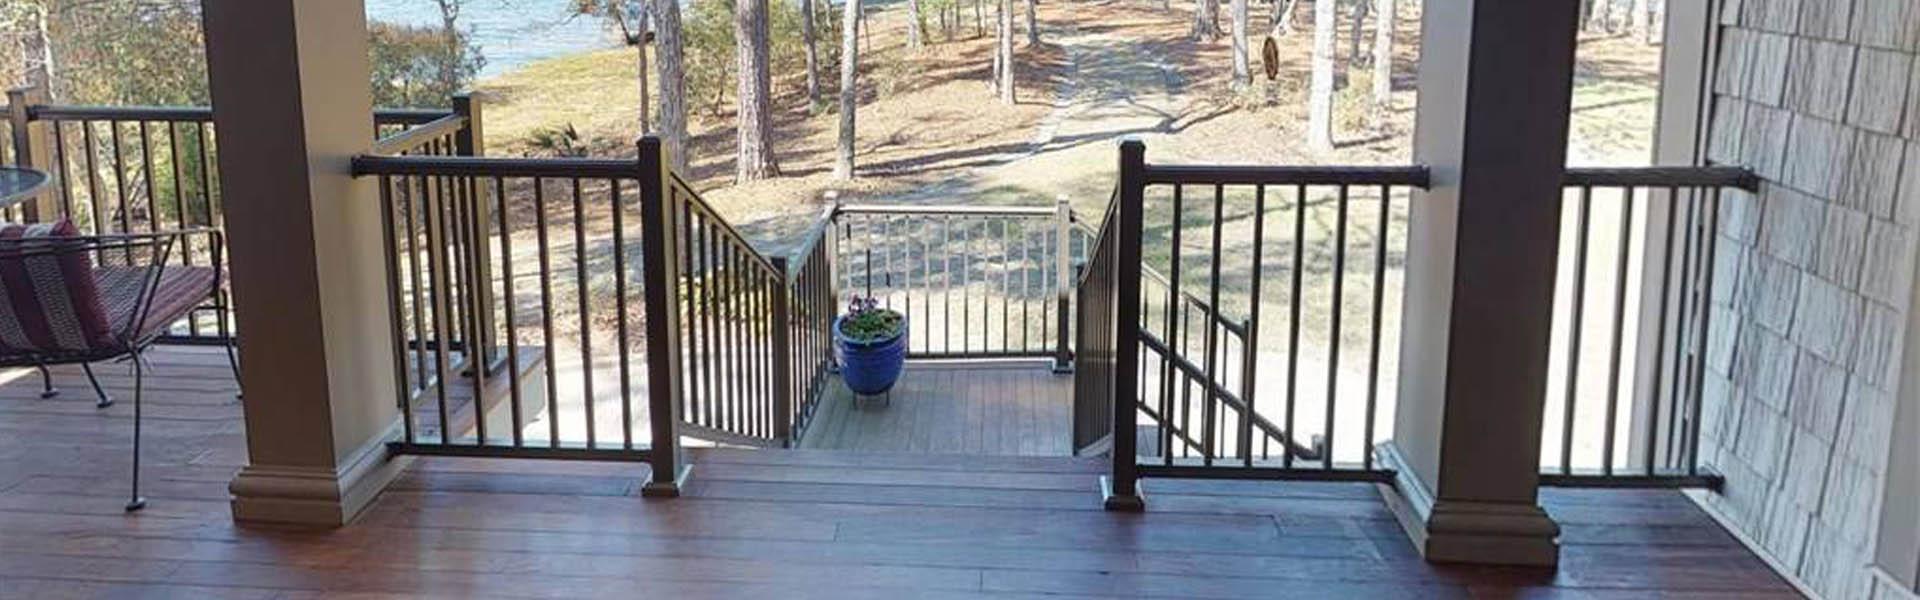 deck builder middletown nj ocean monmouth county deck contractor